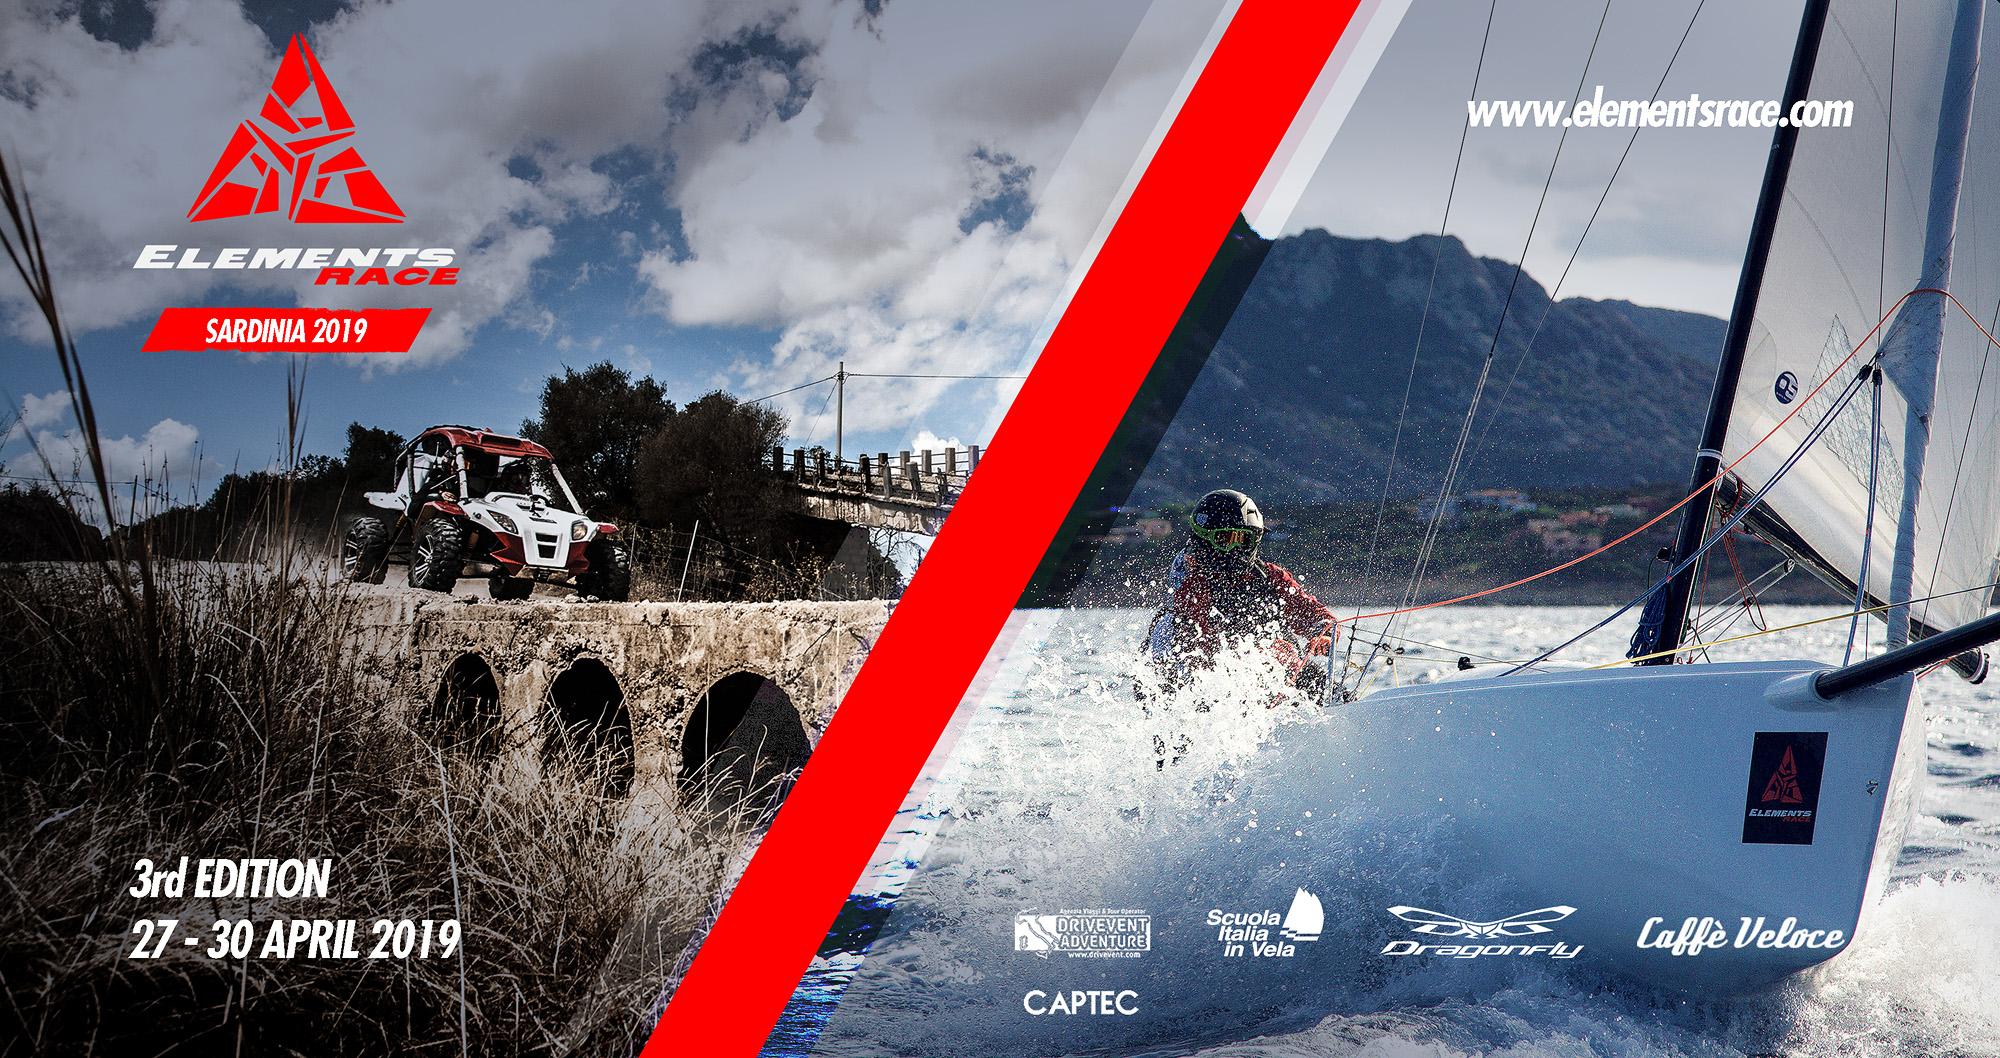 Element Race Sardegna Gara Vela e Fuoristrada